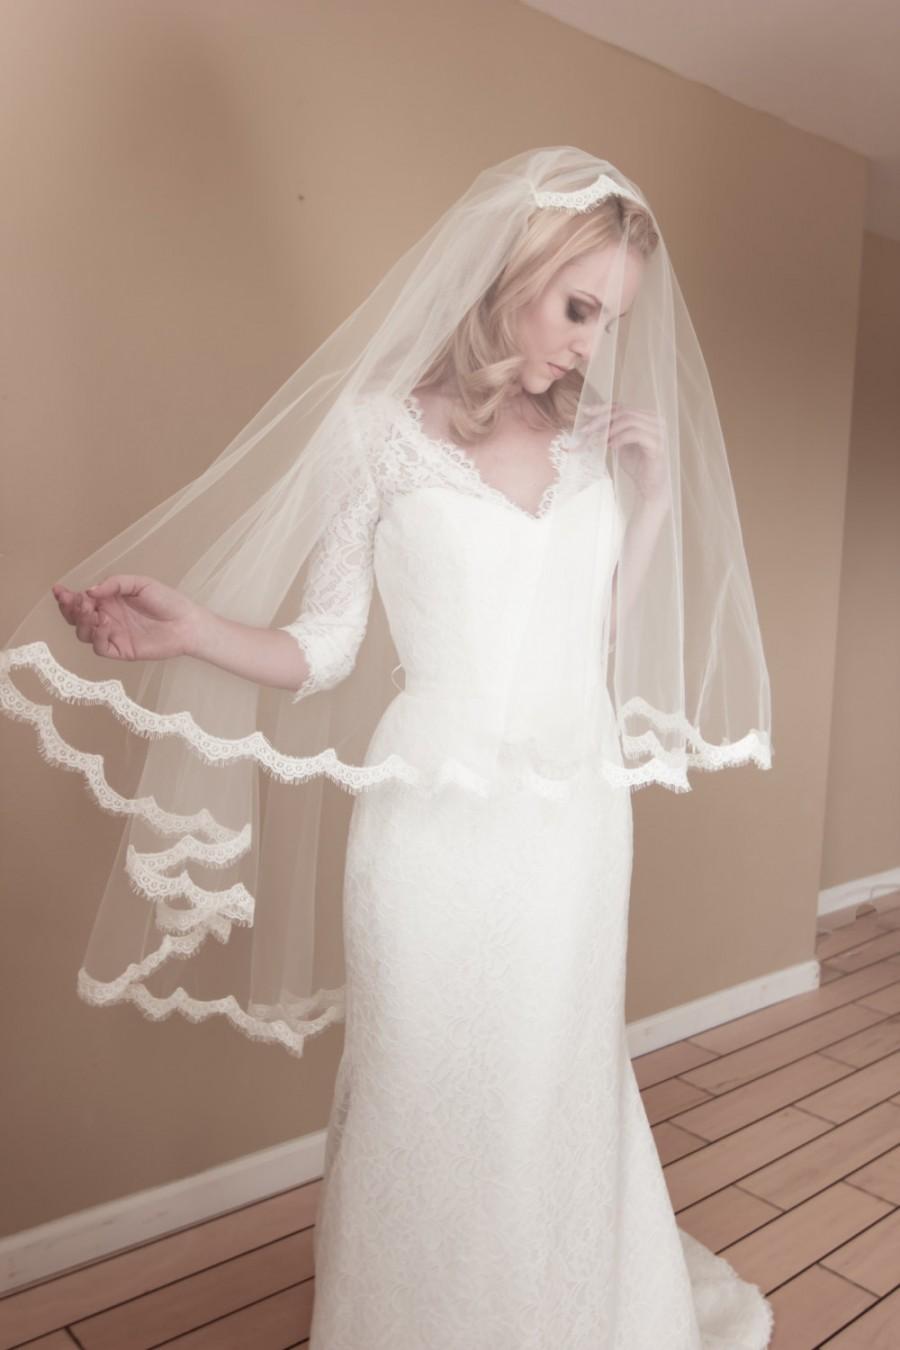 Свадьба - Alencon Eyelash Lace Juliet Bridal Cap Wedding Veil w/ Blusher, Fingertip, Waltz, Chapel, Cathedral, Style: Blushing Lady Lash #1433